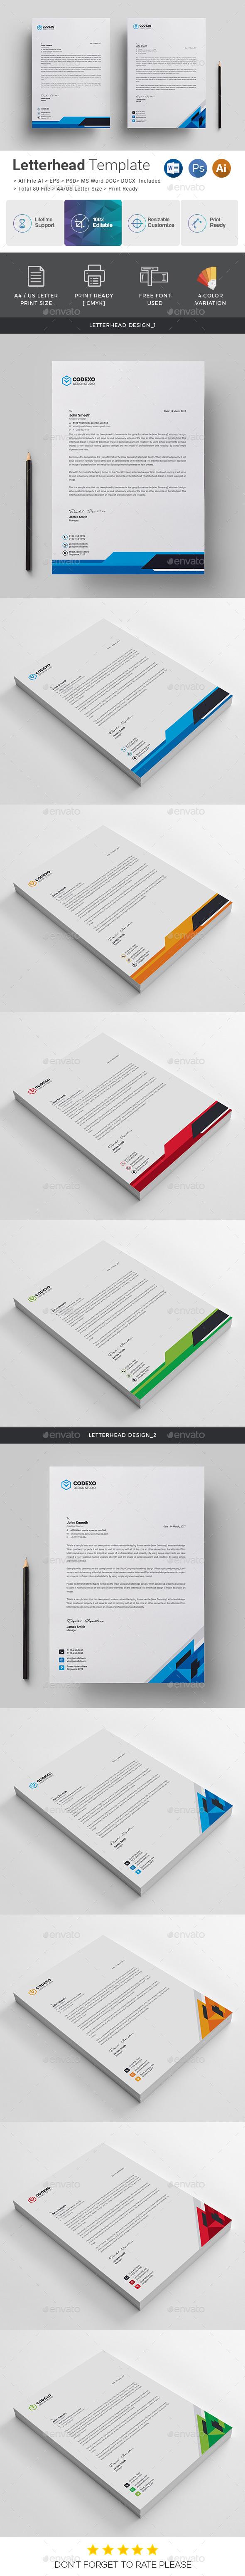 Creative Letterhead Template - Stationery Print Templates